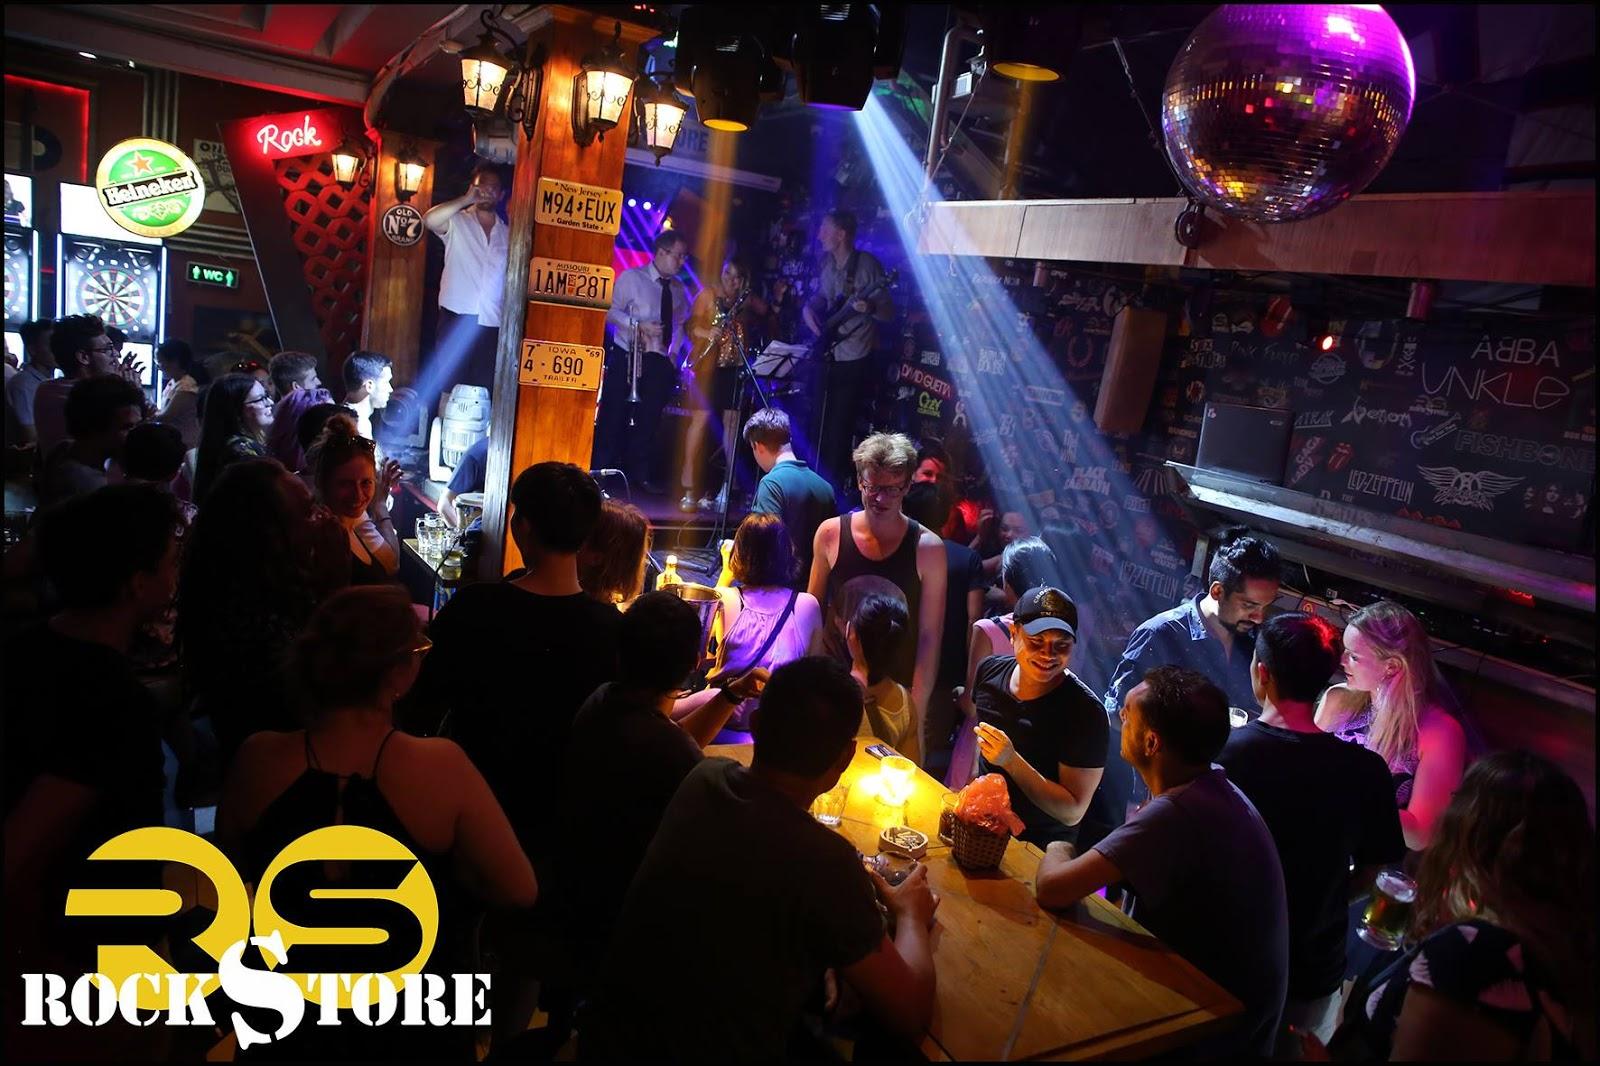 hanoi old quarter bars rockstore bar interior